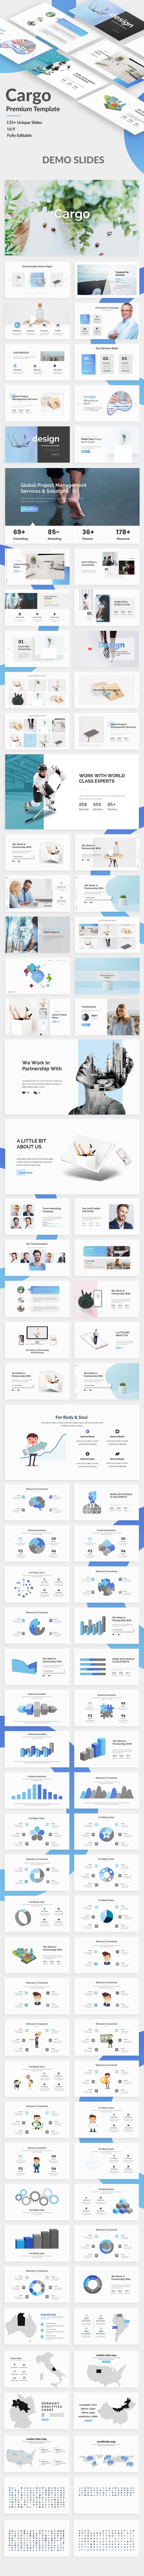 Cargo Creative Powerpoint Template - Creative PowerPoint Templates